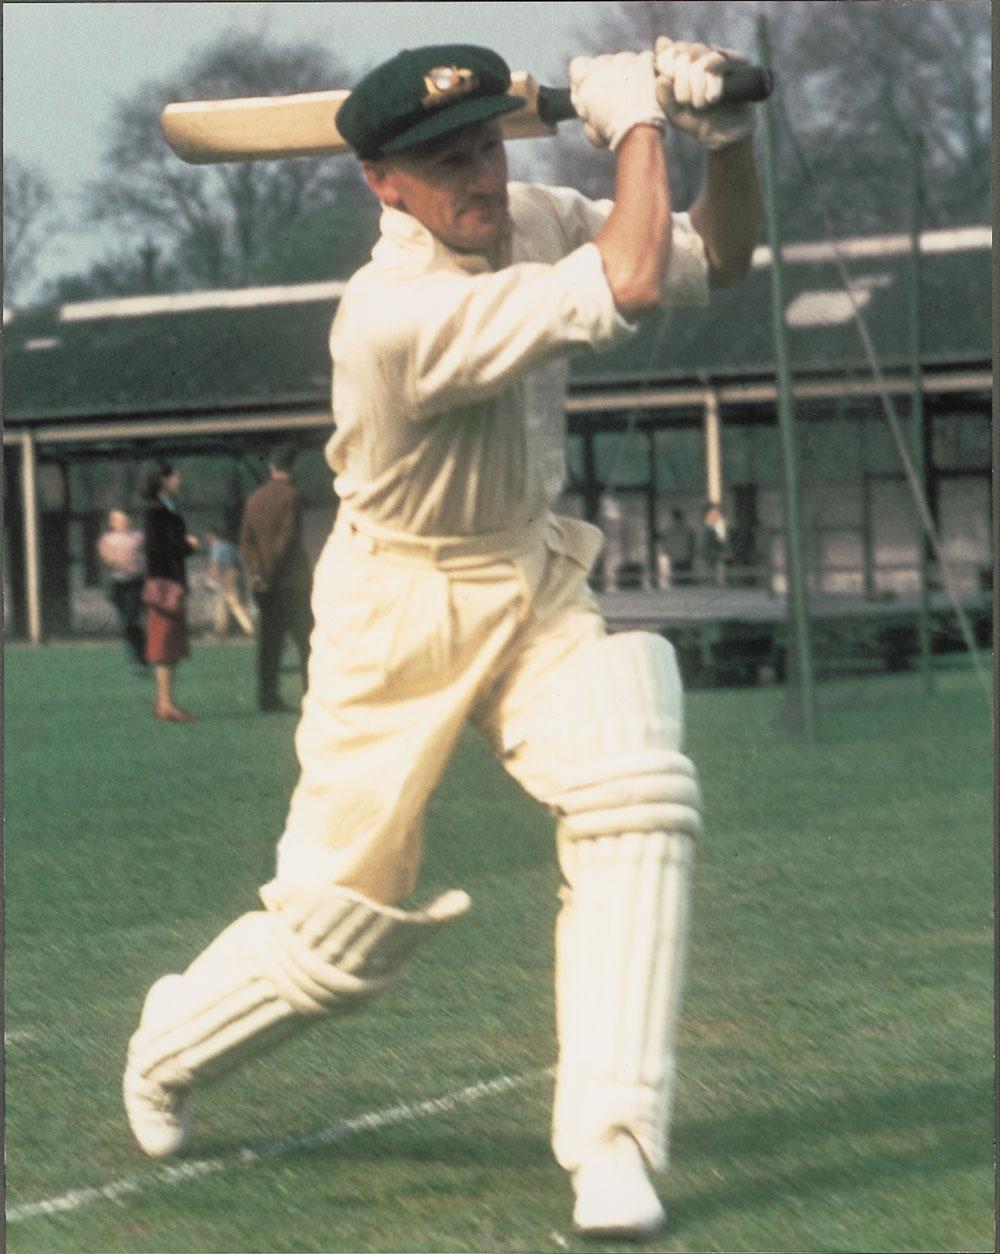 A rare colour photograph taken of Don Bradman during the 1948 tour of England. Courtesy Bradman Foundation.